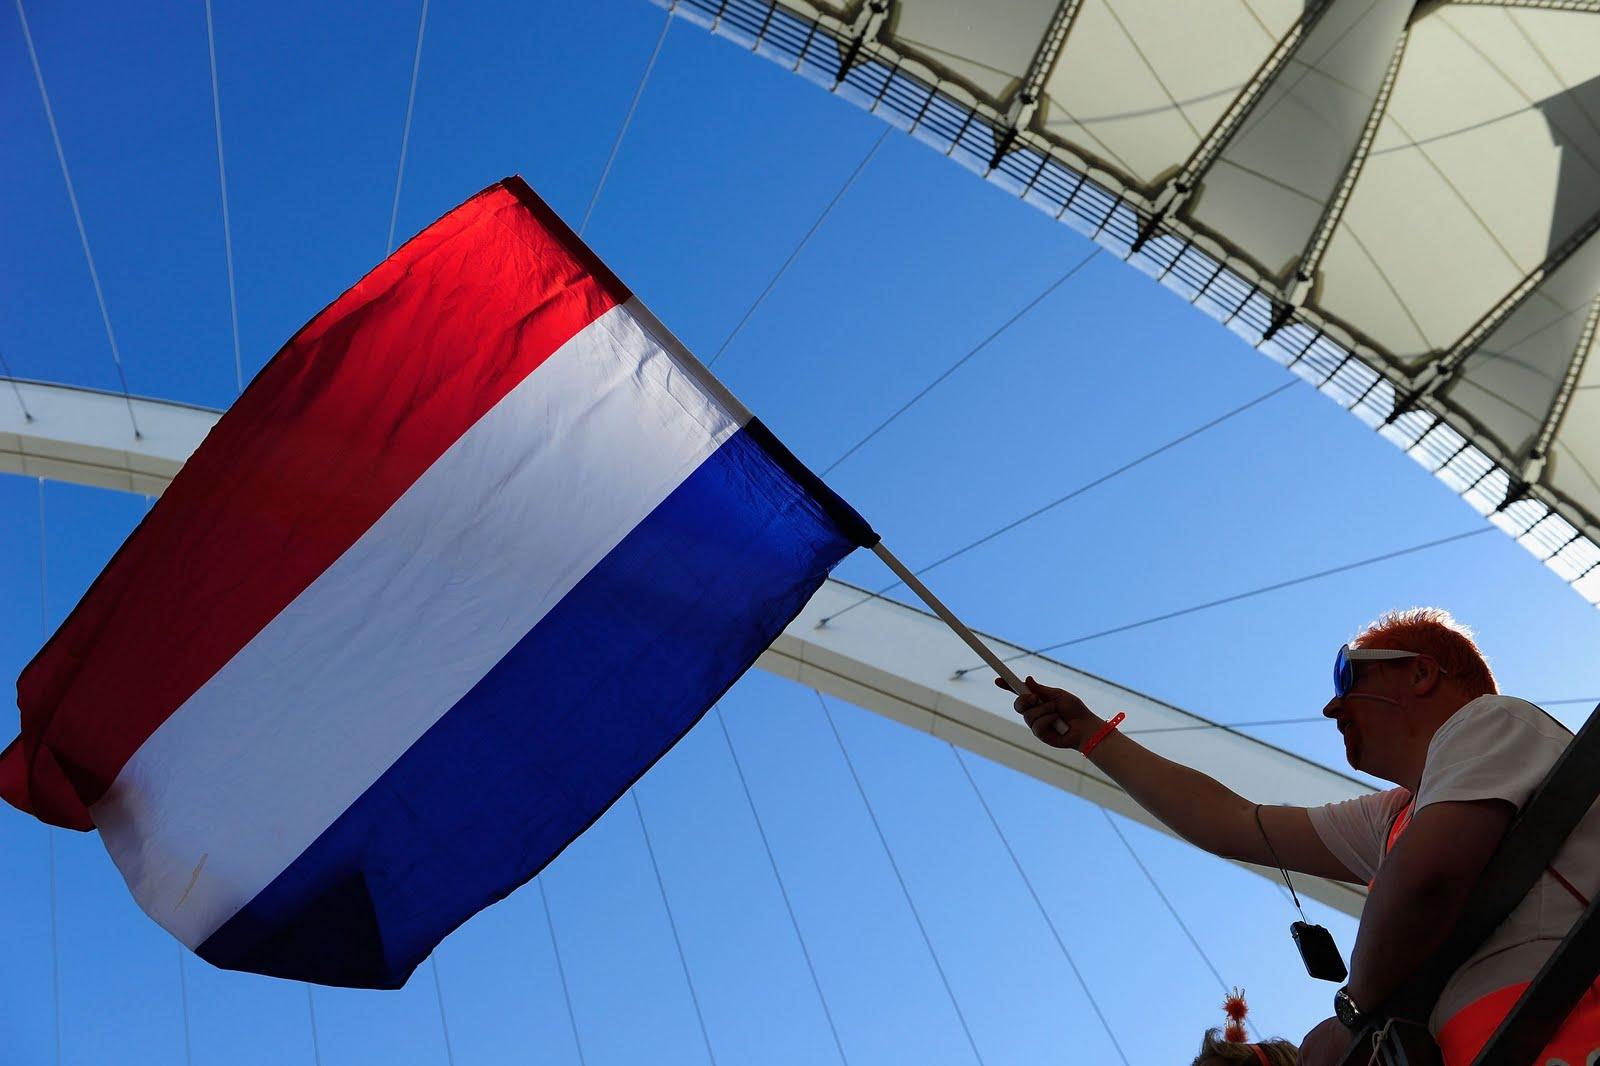 http://2.bp.blogspot.com/-AAbDYUr9S4c/Tch2WBN5byI/AAAAAAAAAx0/w3vTZ90NdX8/s1600/Wallpapers+Flag+of+Netherlands+%25281%2529.jpg